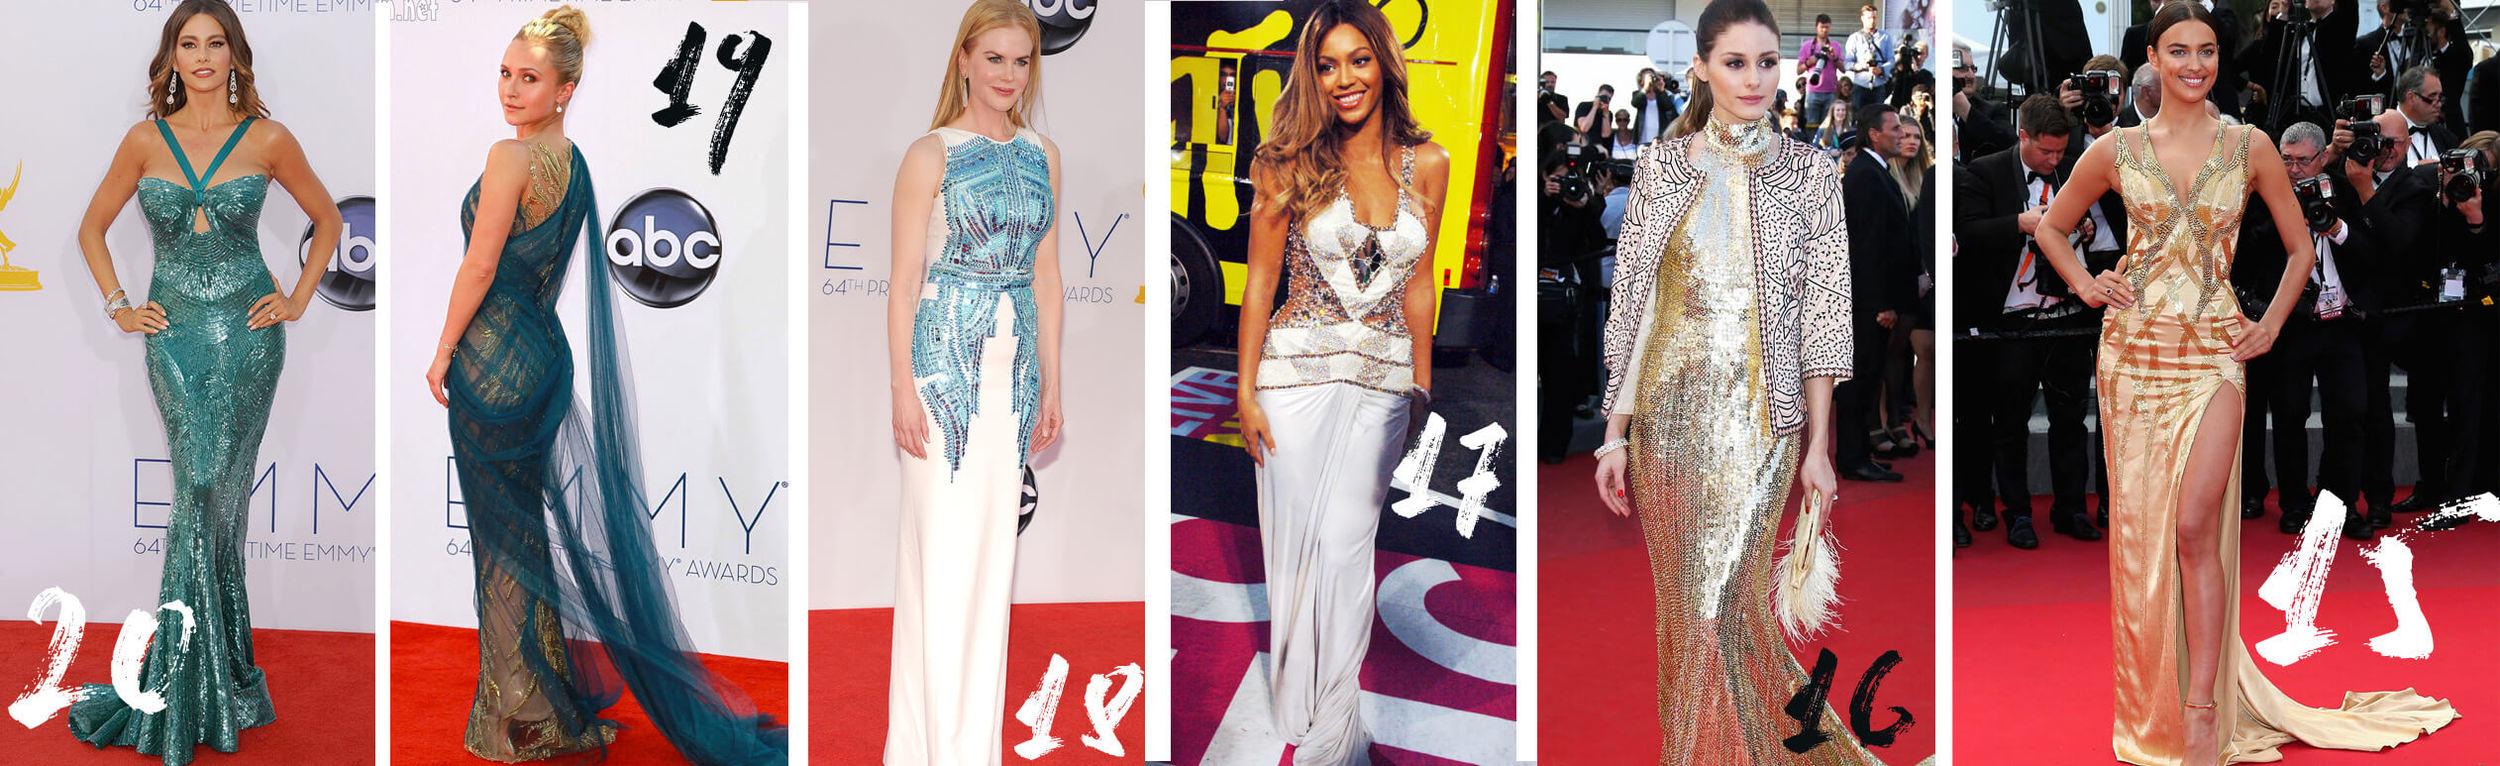 20. Sofia Vergara 19. Hayden Panettiere 18. Nicole Kidman 17. Beyonce 16. Olivia Palermo 15. Irina Shayk